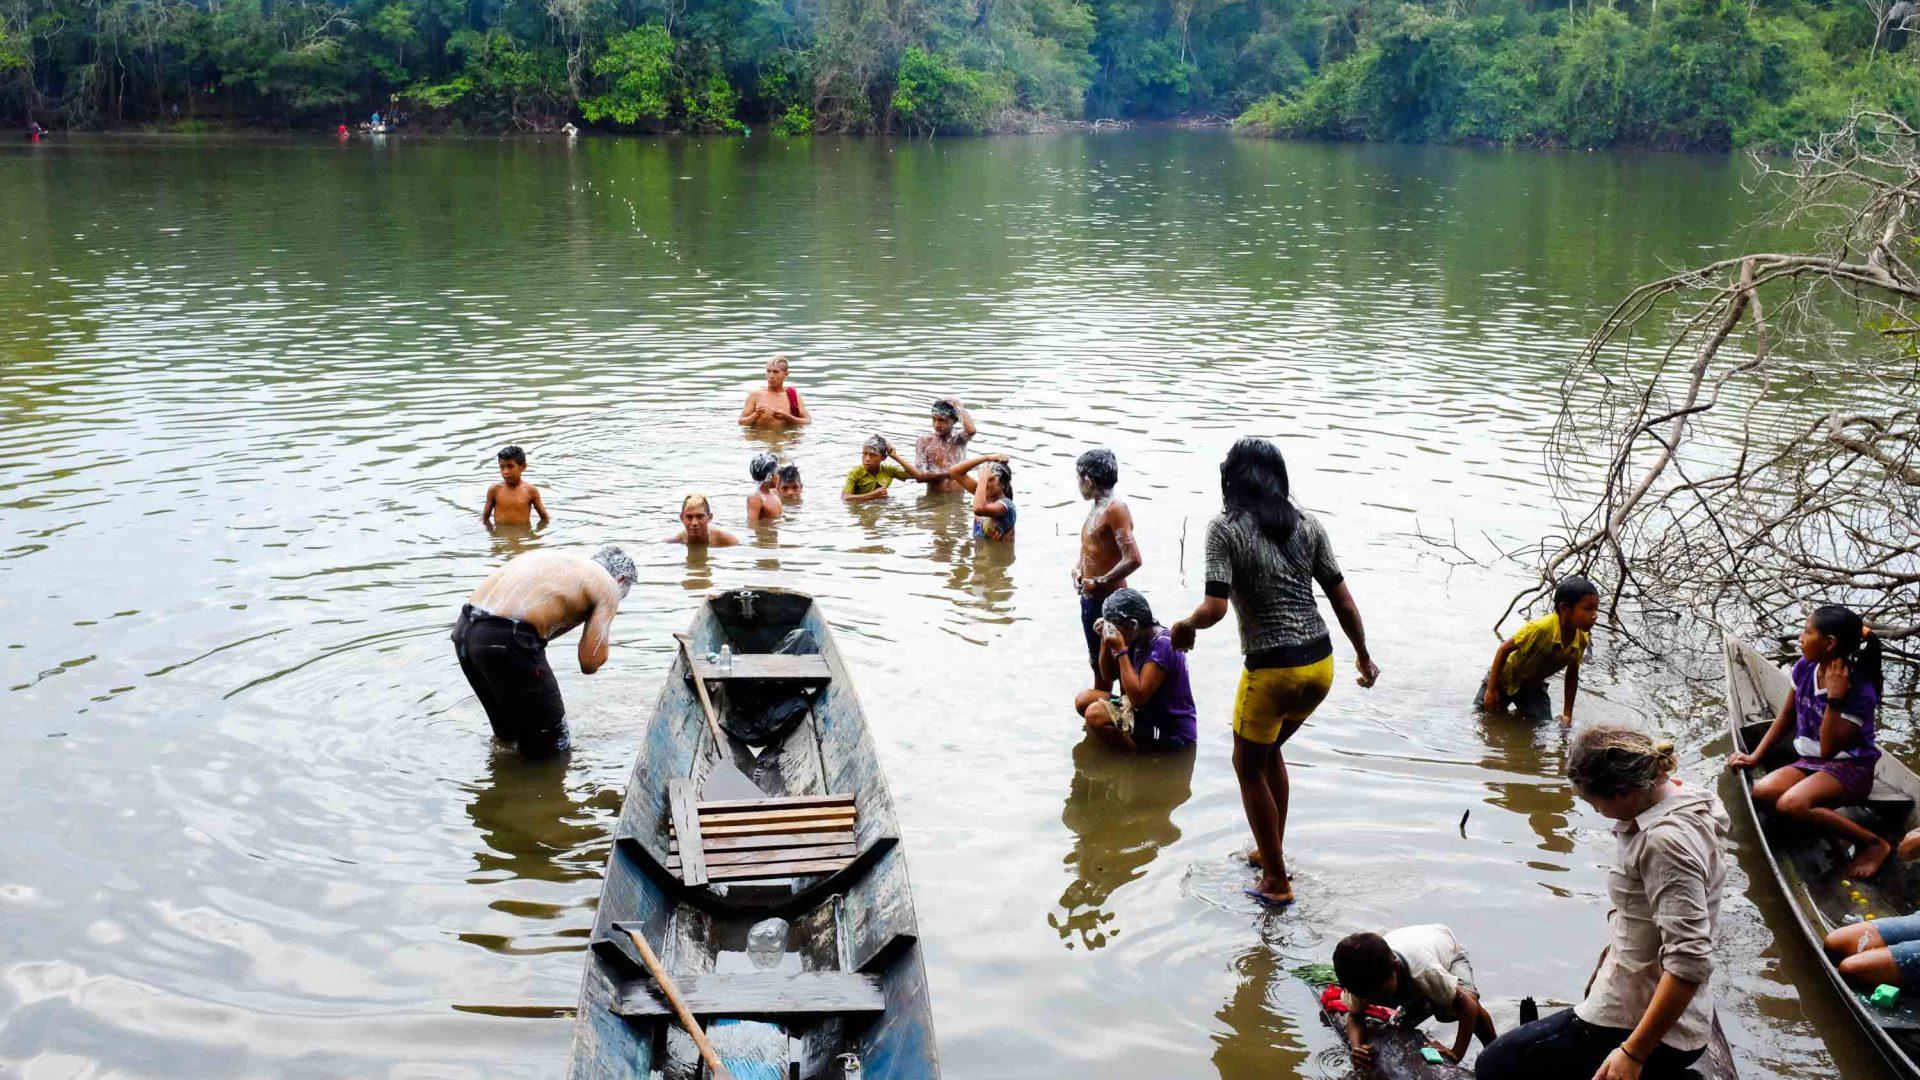 Taking part in the annual fishing ritual of the Munduruku tribe in Brazil.